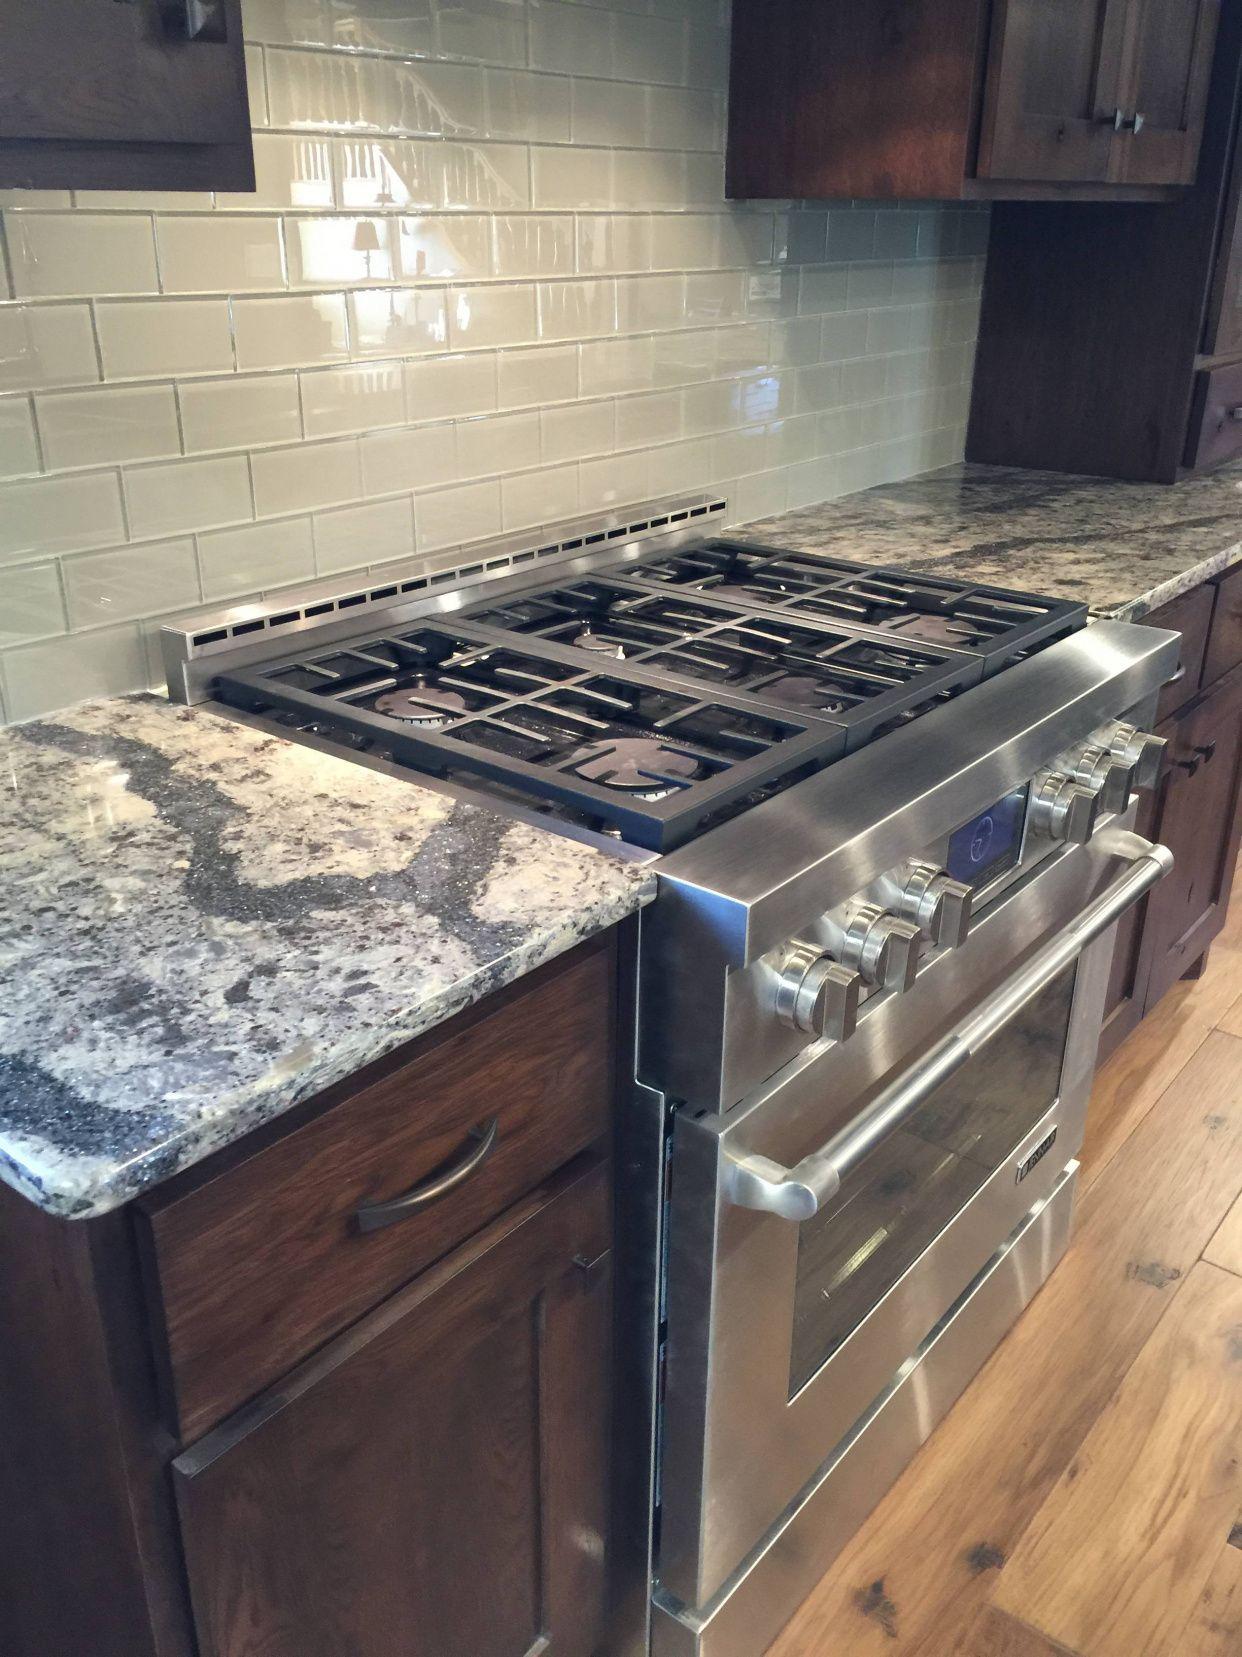 2019 Granite Countertops Columbus Oh   Kitchen Cabinets Countertops Ideas  Check More At Http:/